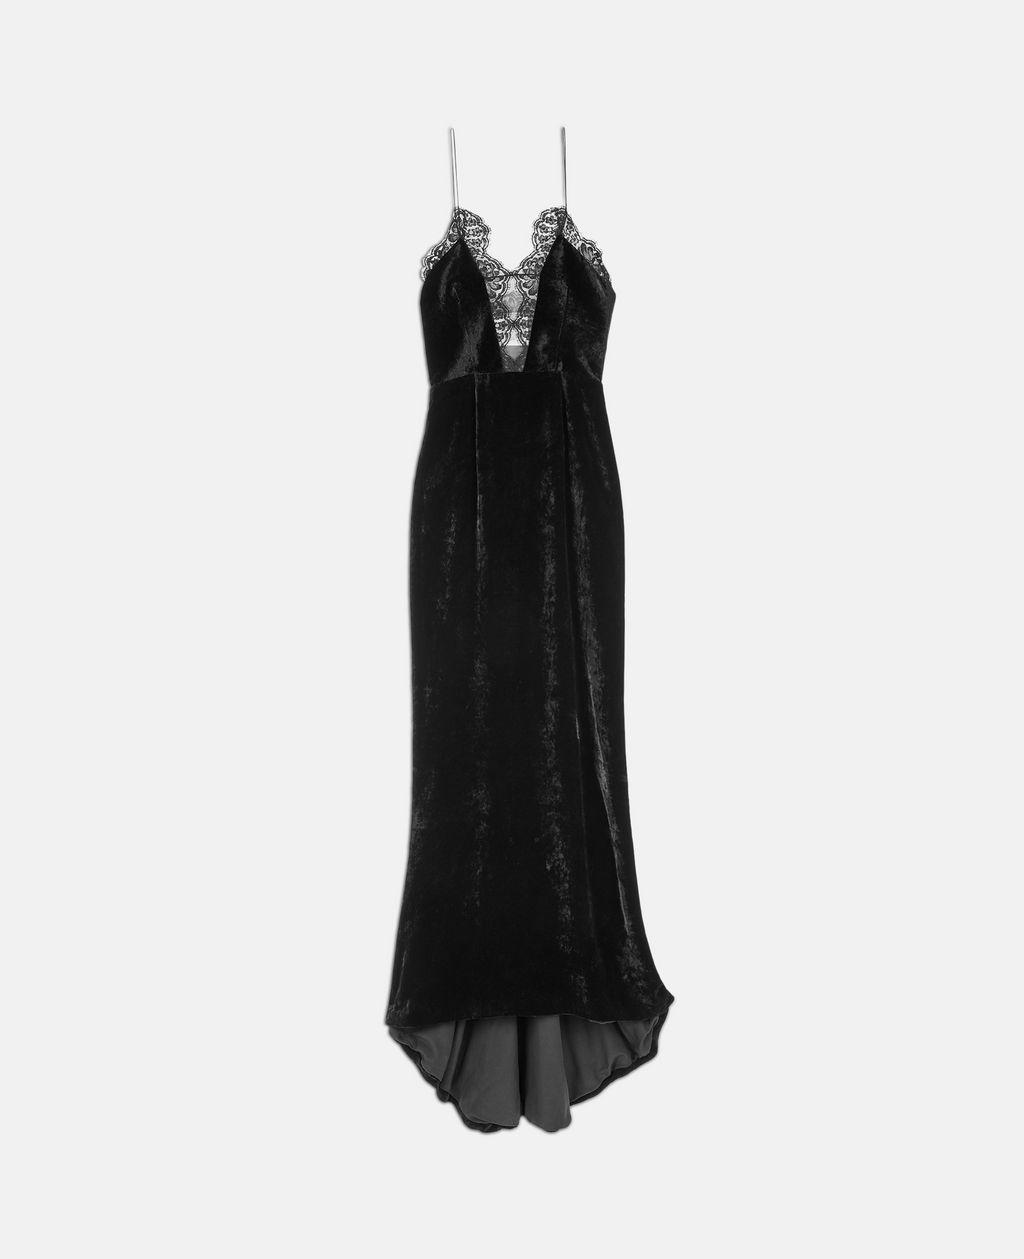 Stella Mccartney Gowns, Black